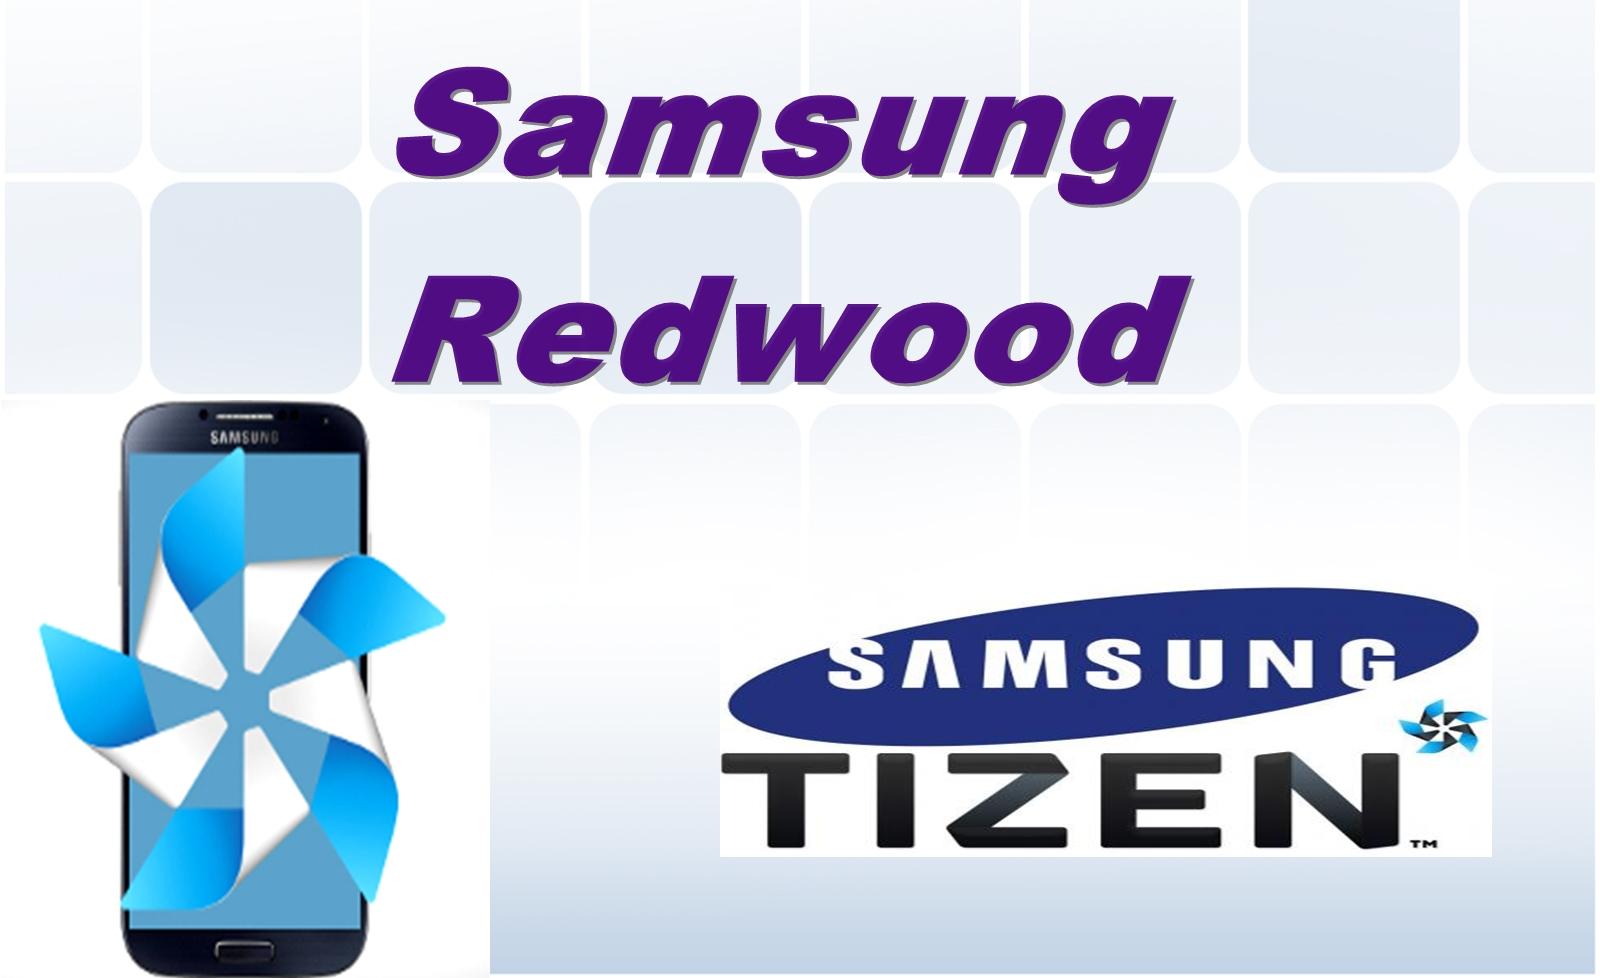 Samsung Redwood